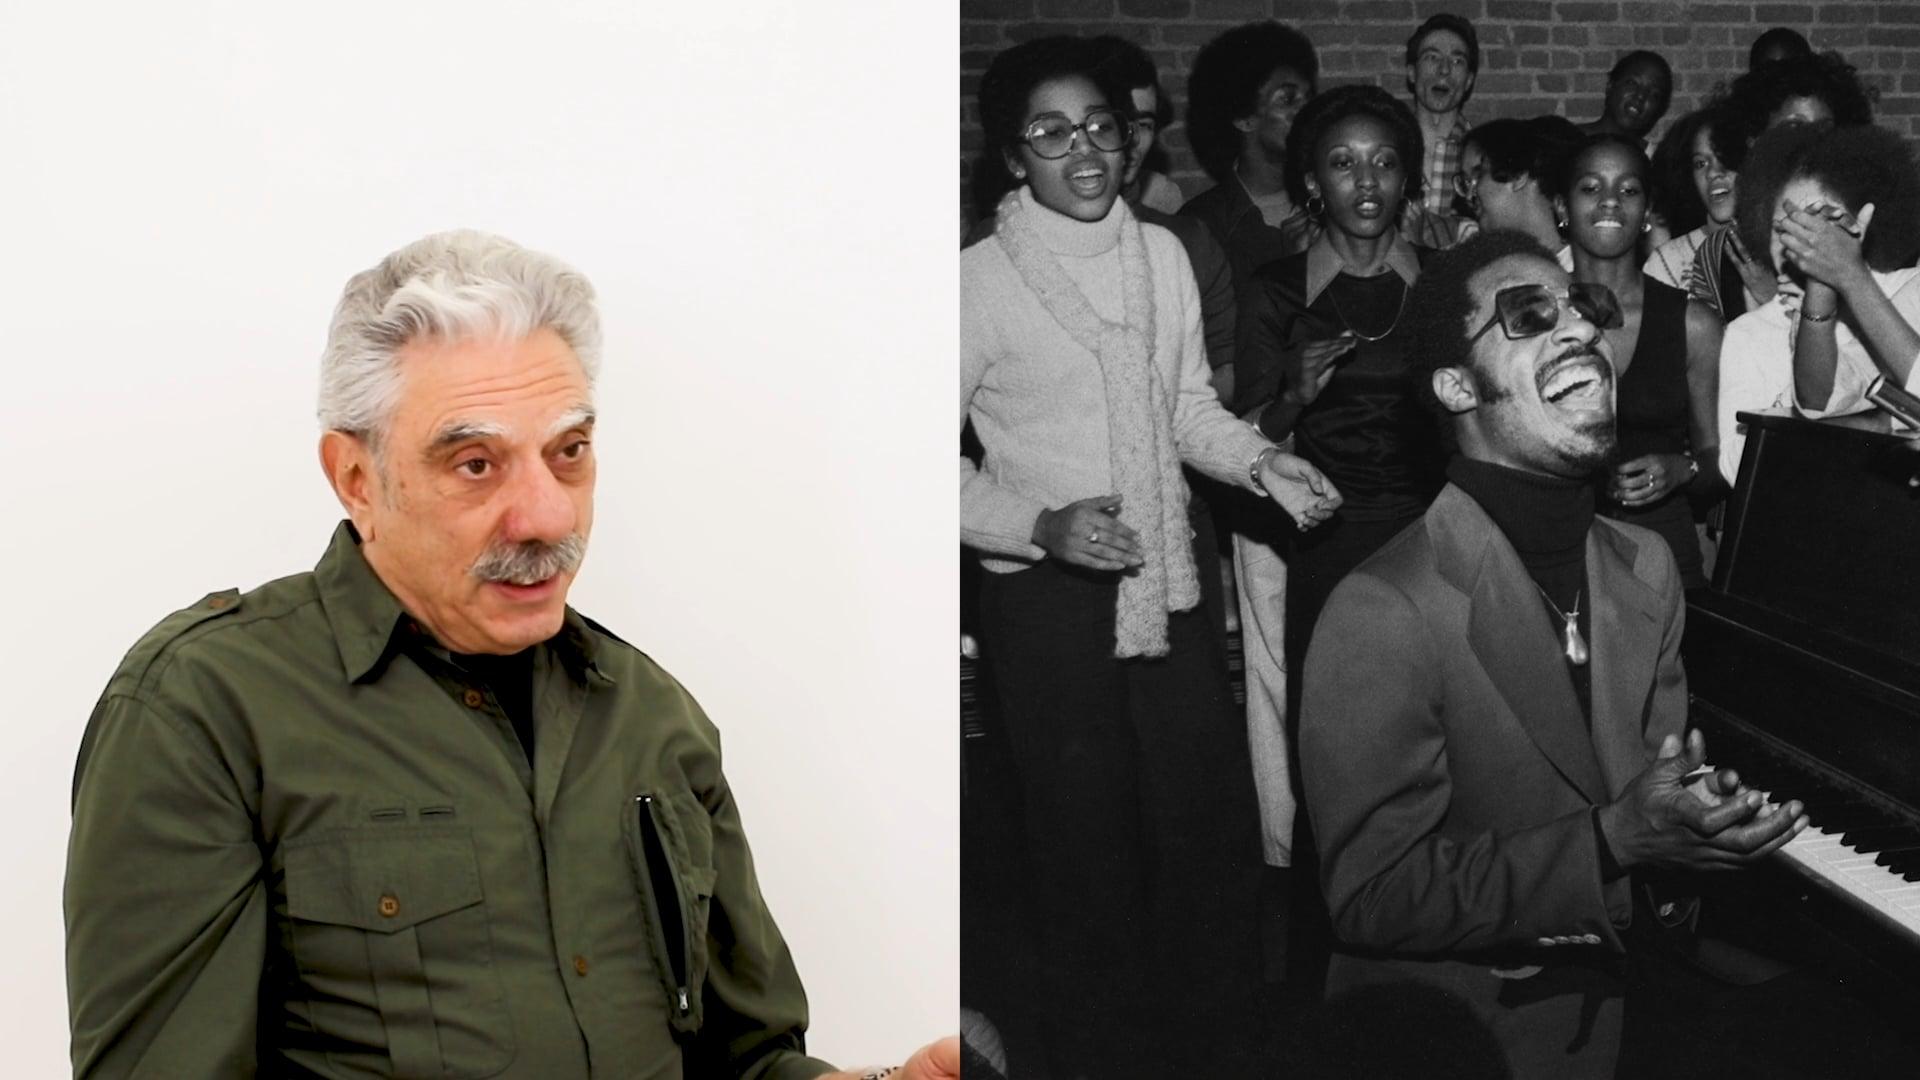 Photographer Allan Tannenbaum discusses Stevie Wonder